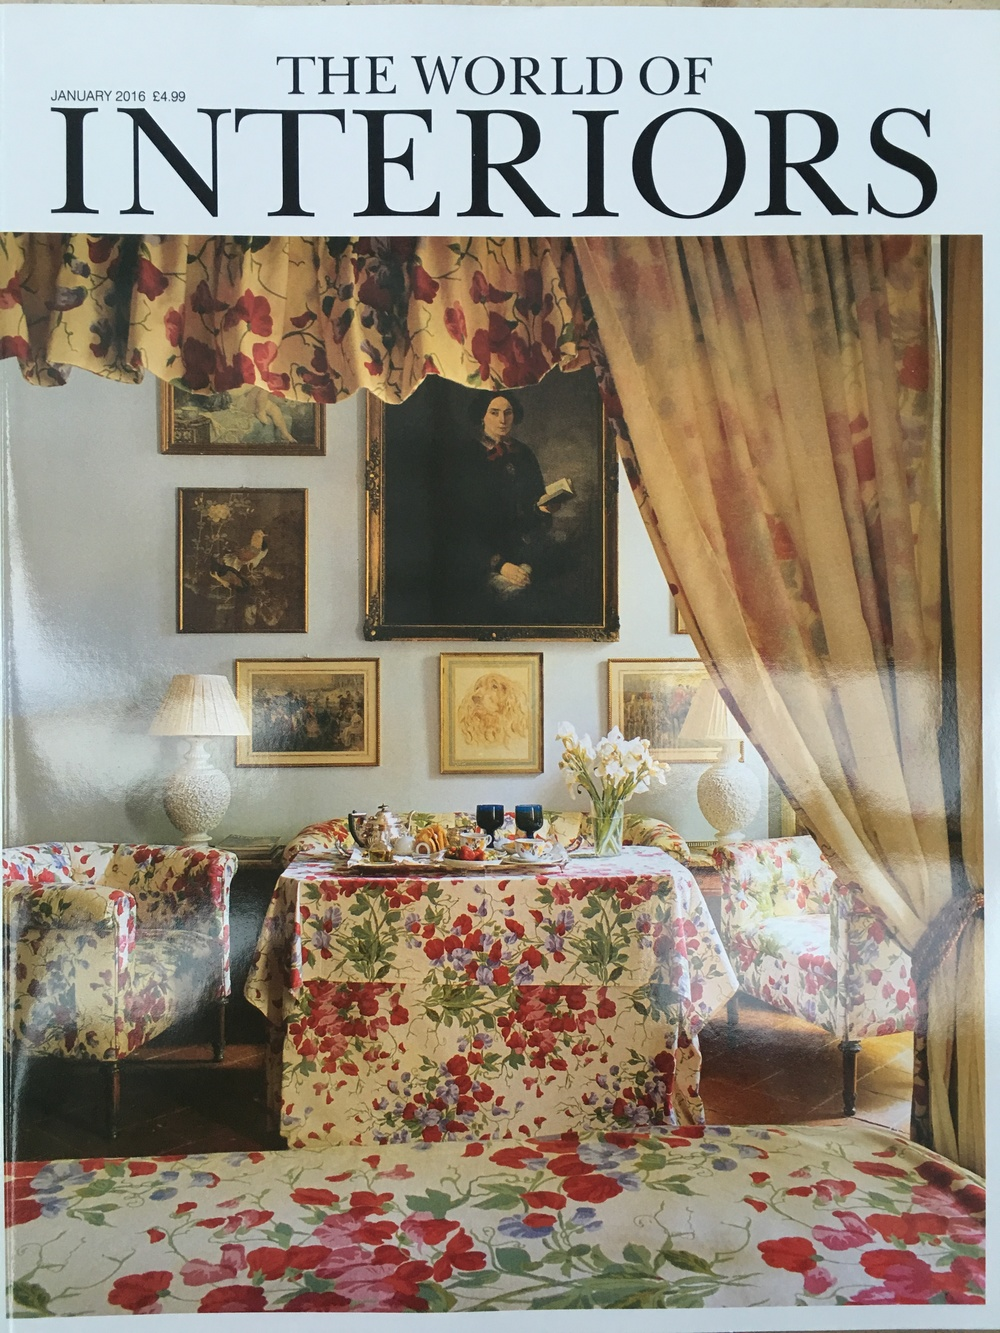 The World of Interiors January 2016